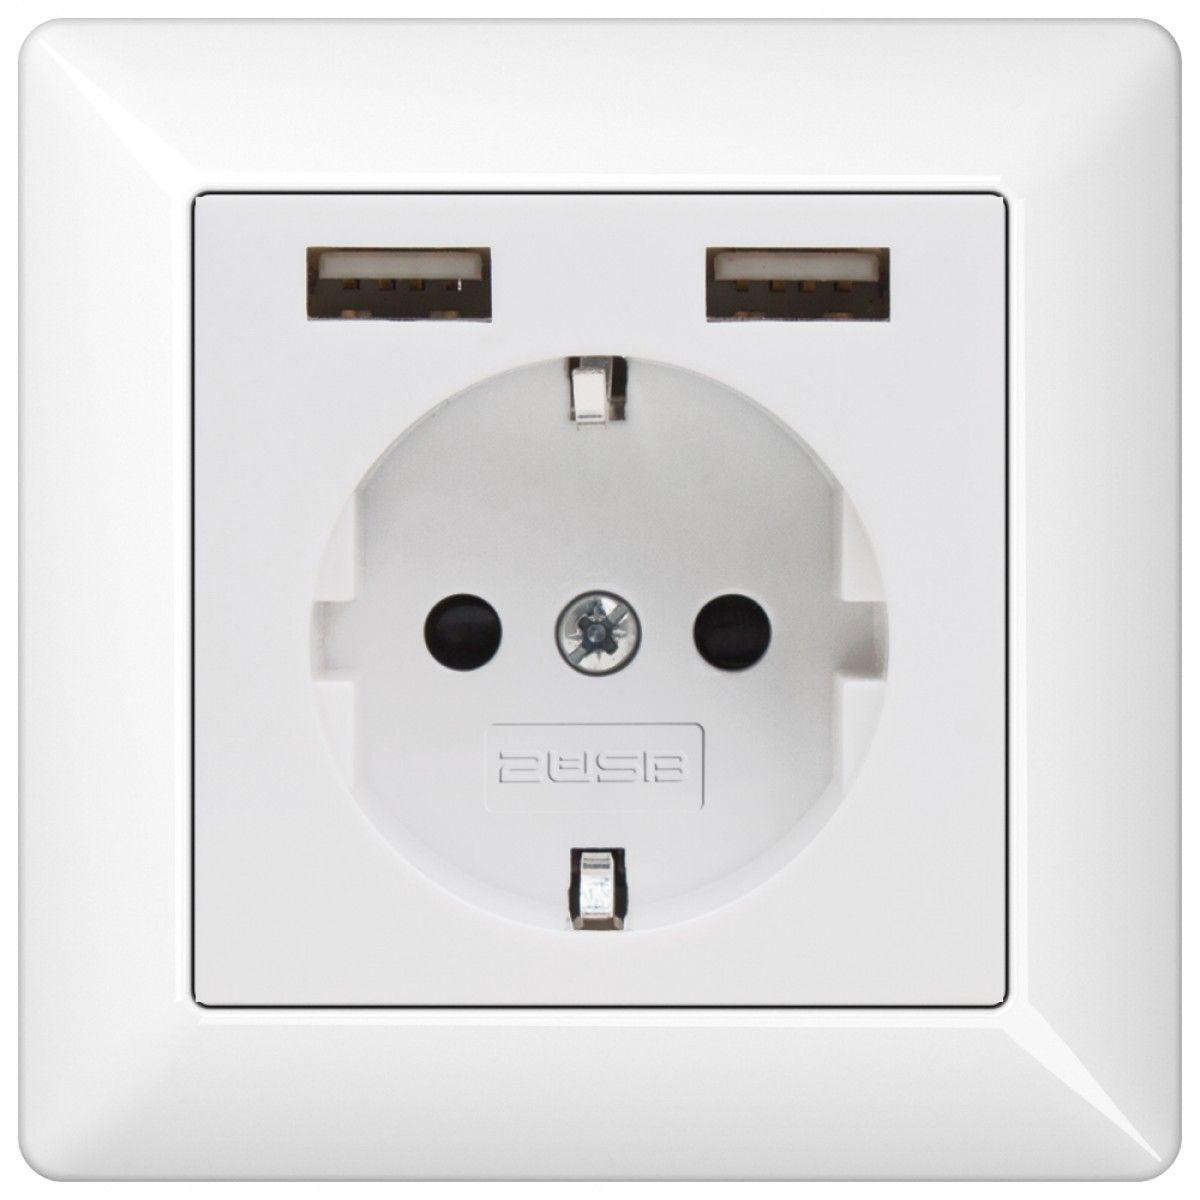 jung usb stopcontact met 2usb electra pinterest. Black Bedroom Furniture Sets. Home Design Ideas